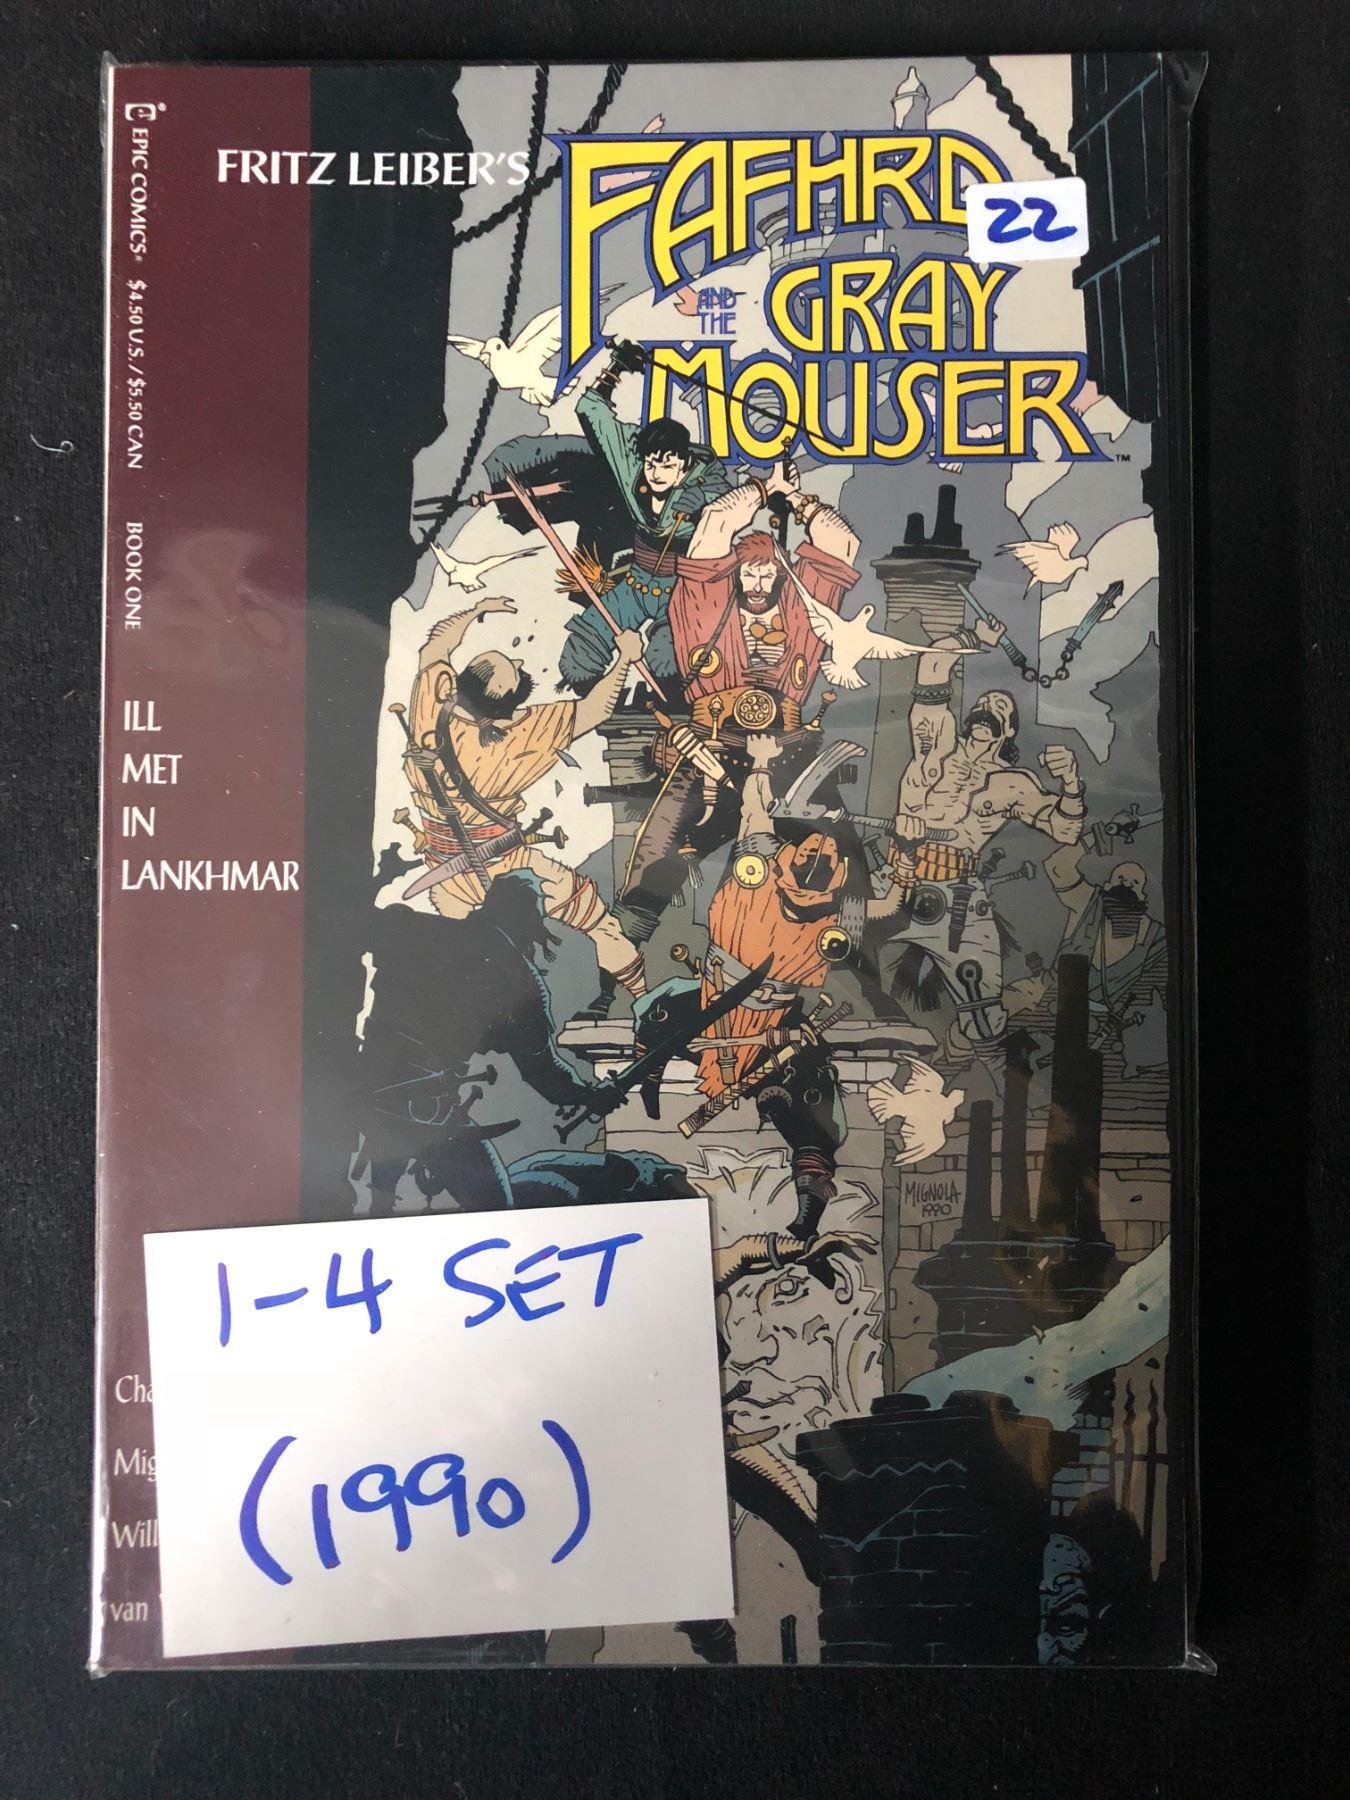 1990 FAFHRD GRAY MOUSER SET (1-4) BY FRITZ LIEBER